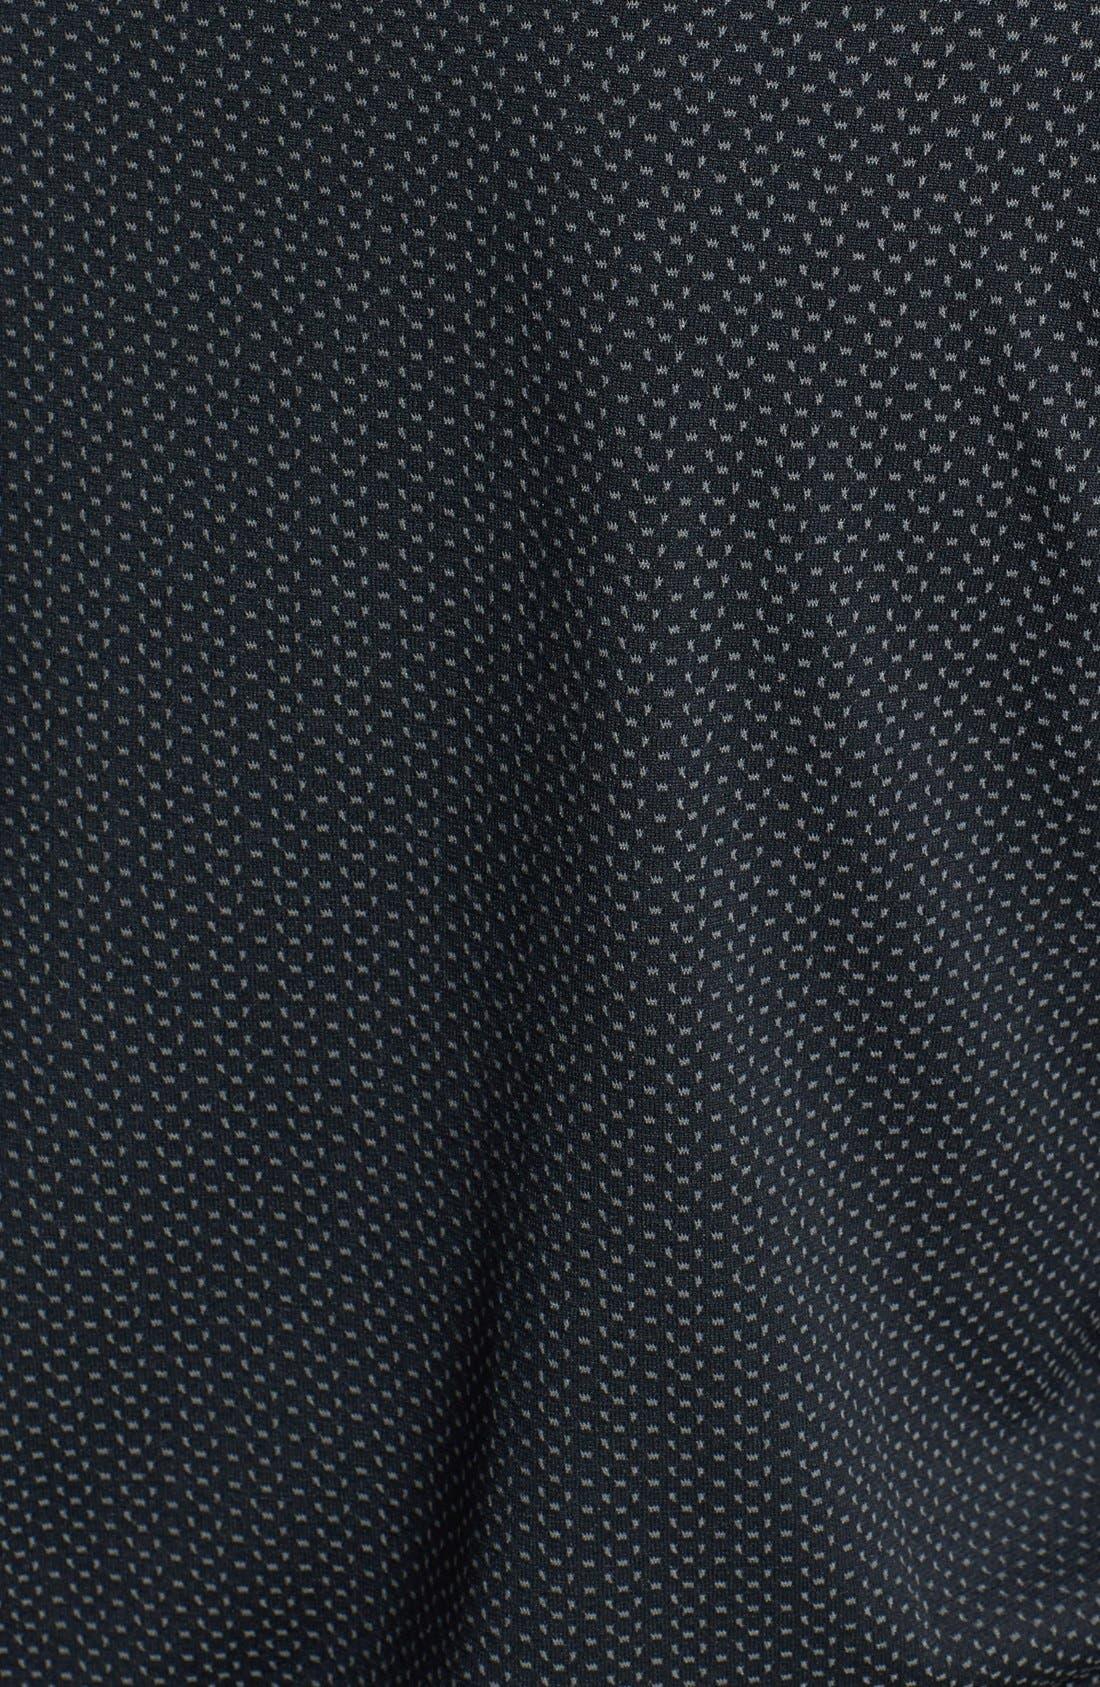 'Epic' Dri-FIT Knit Boatneck Top,                             Alternate thumbnail 2, color,                             010